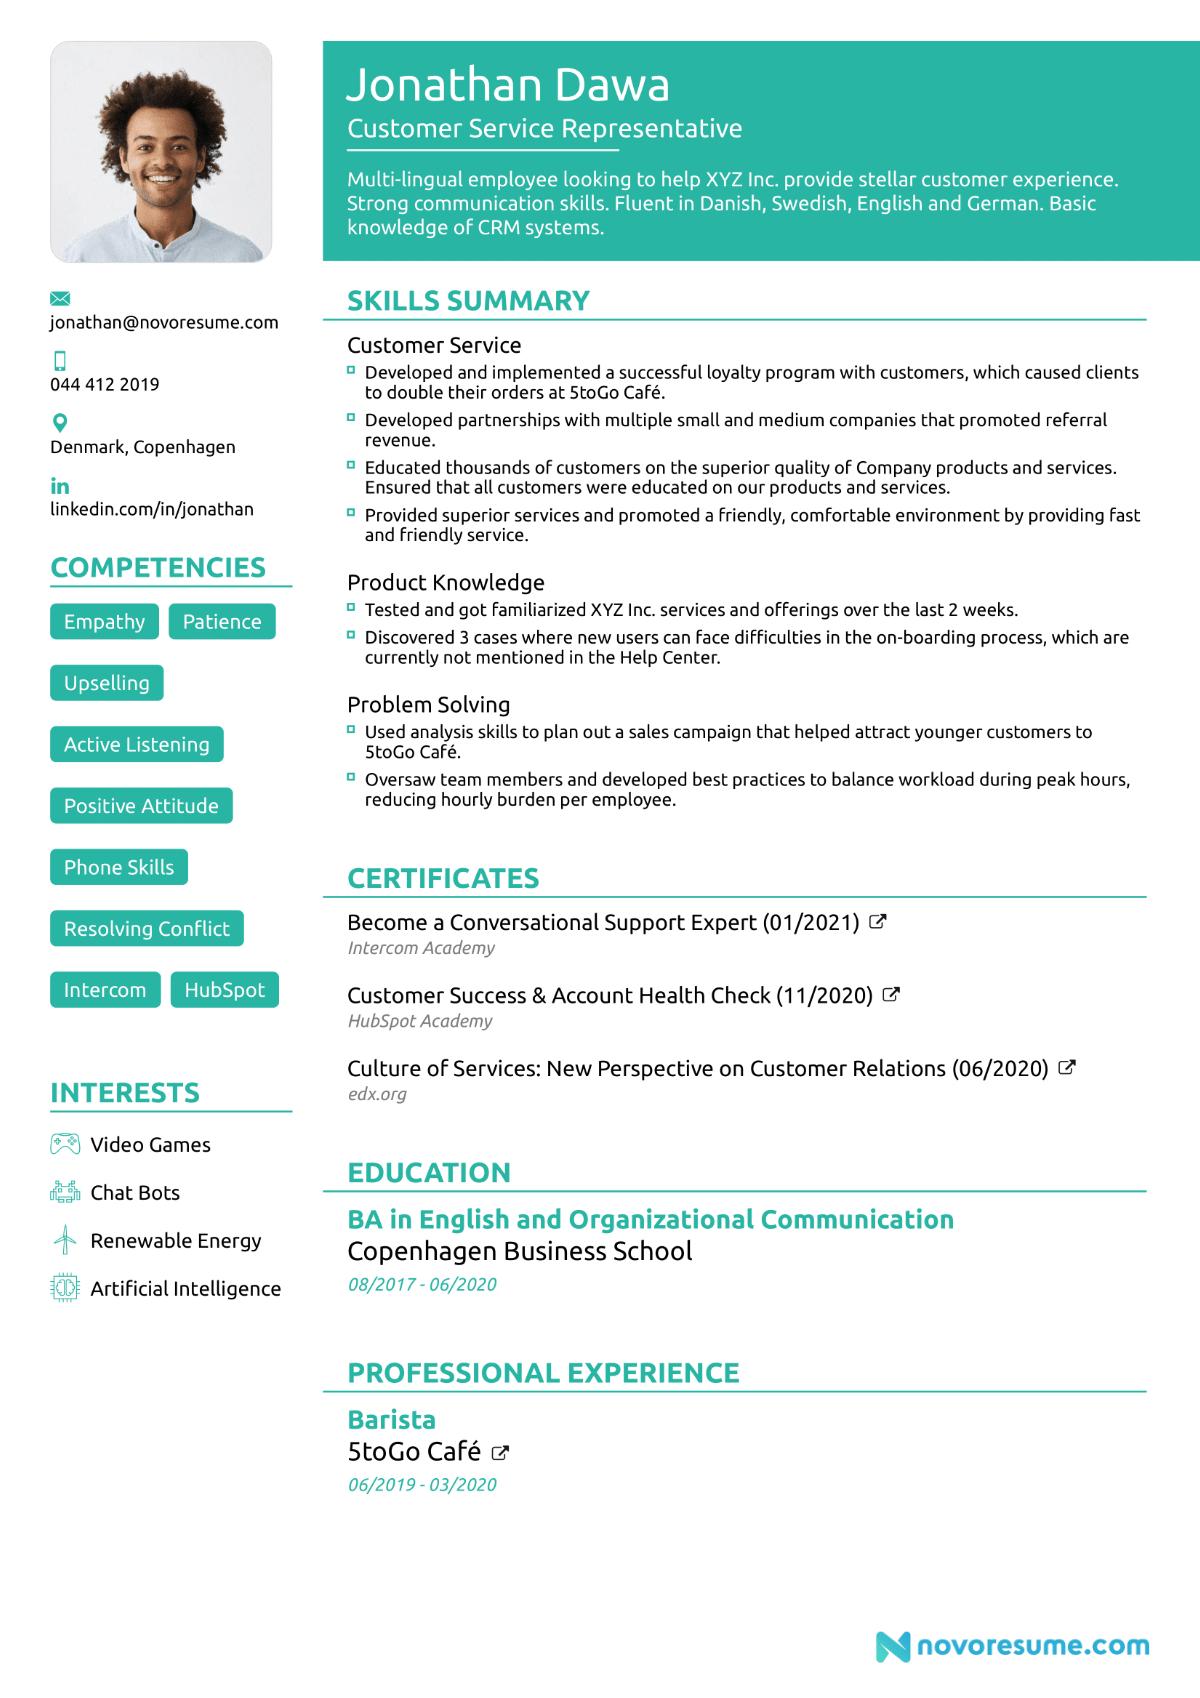 career change cv structure